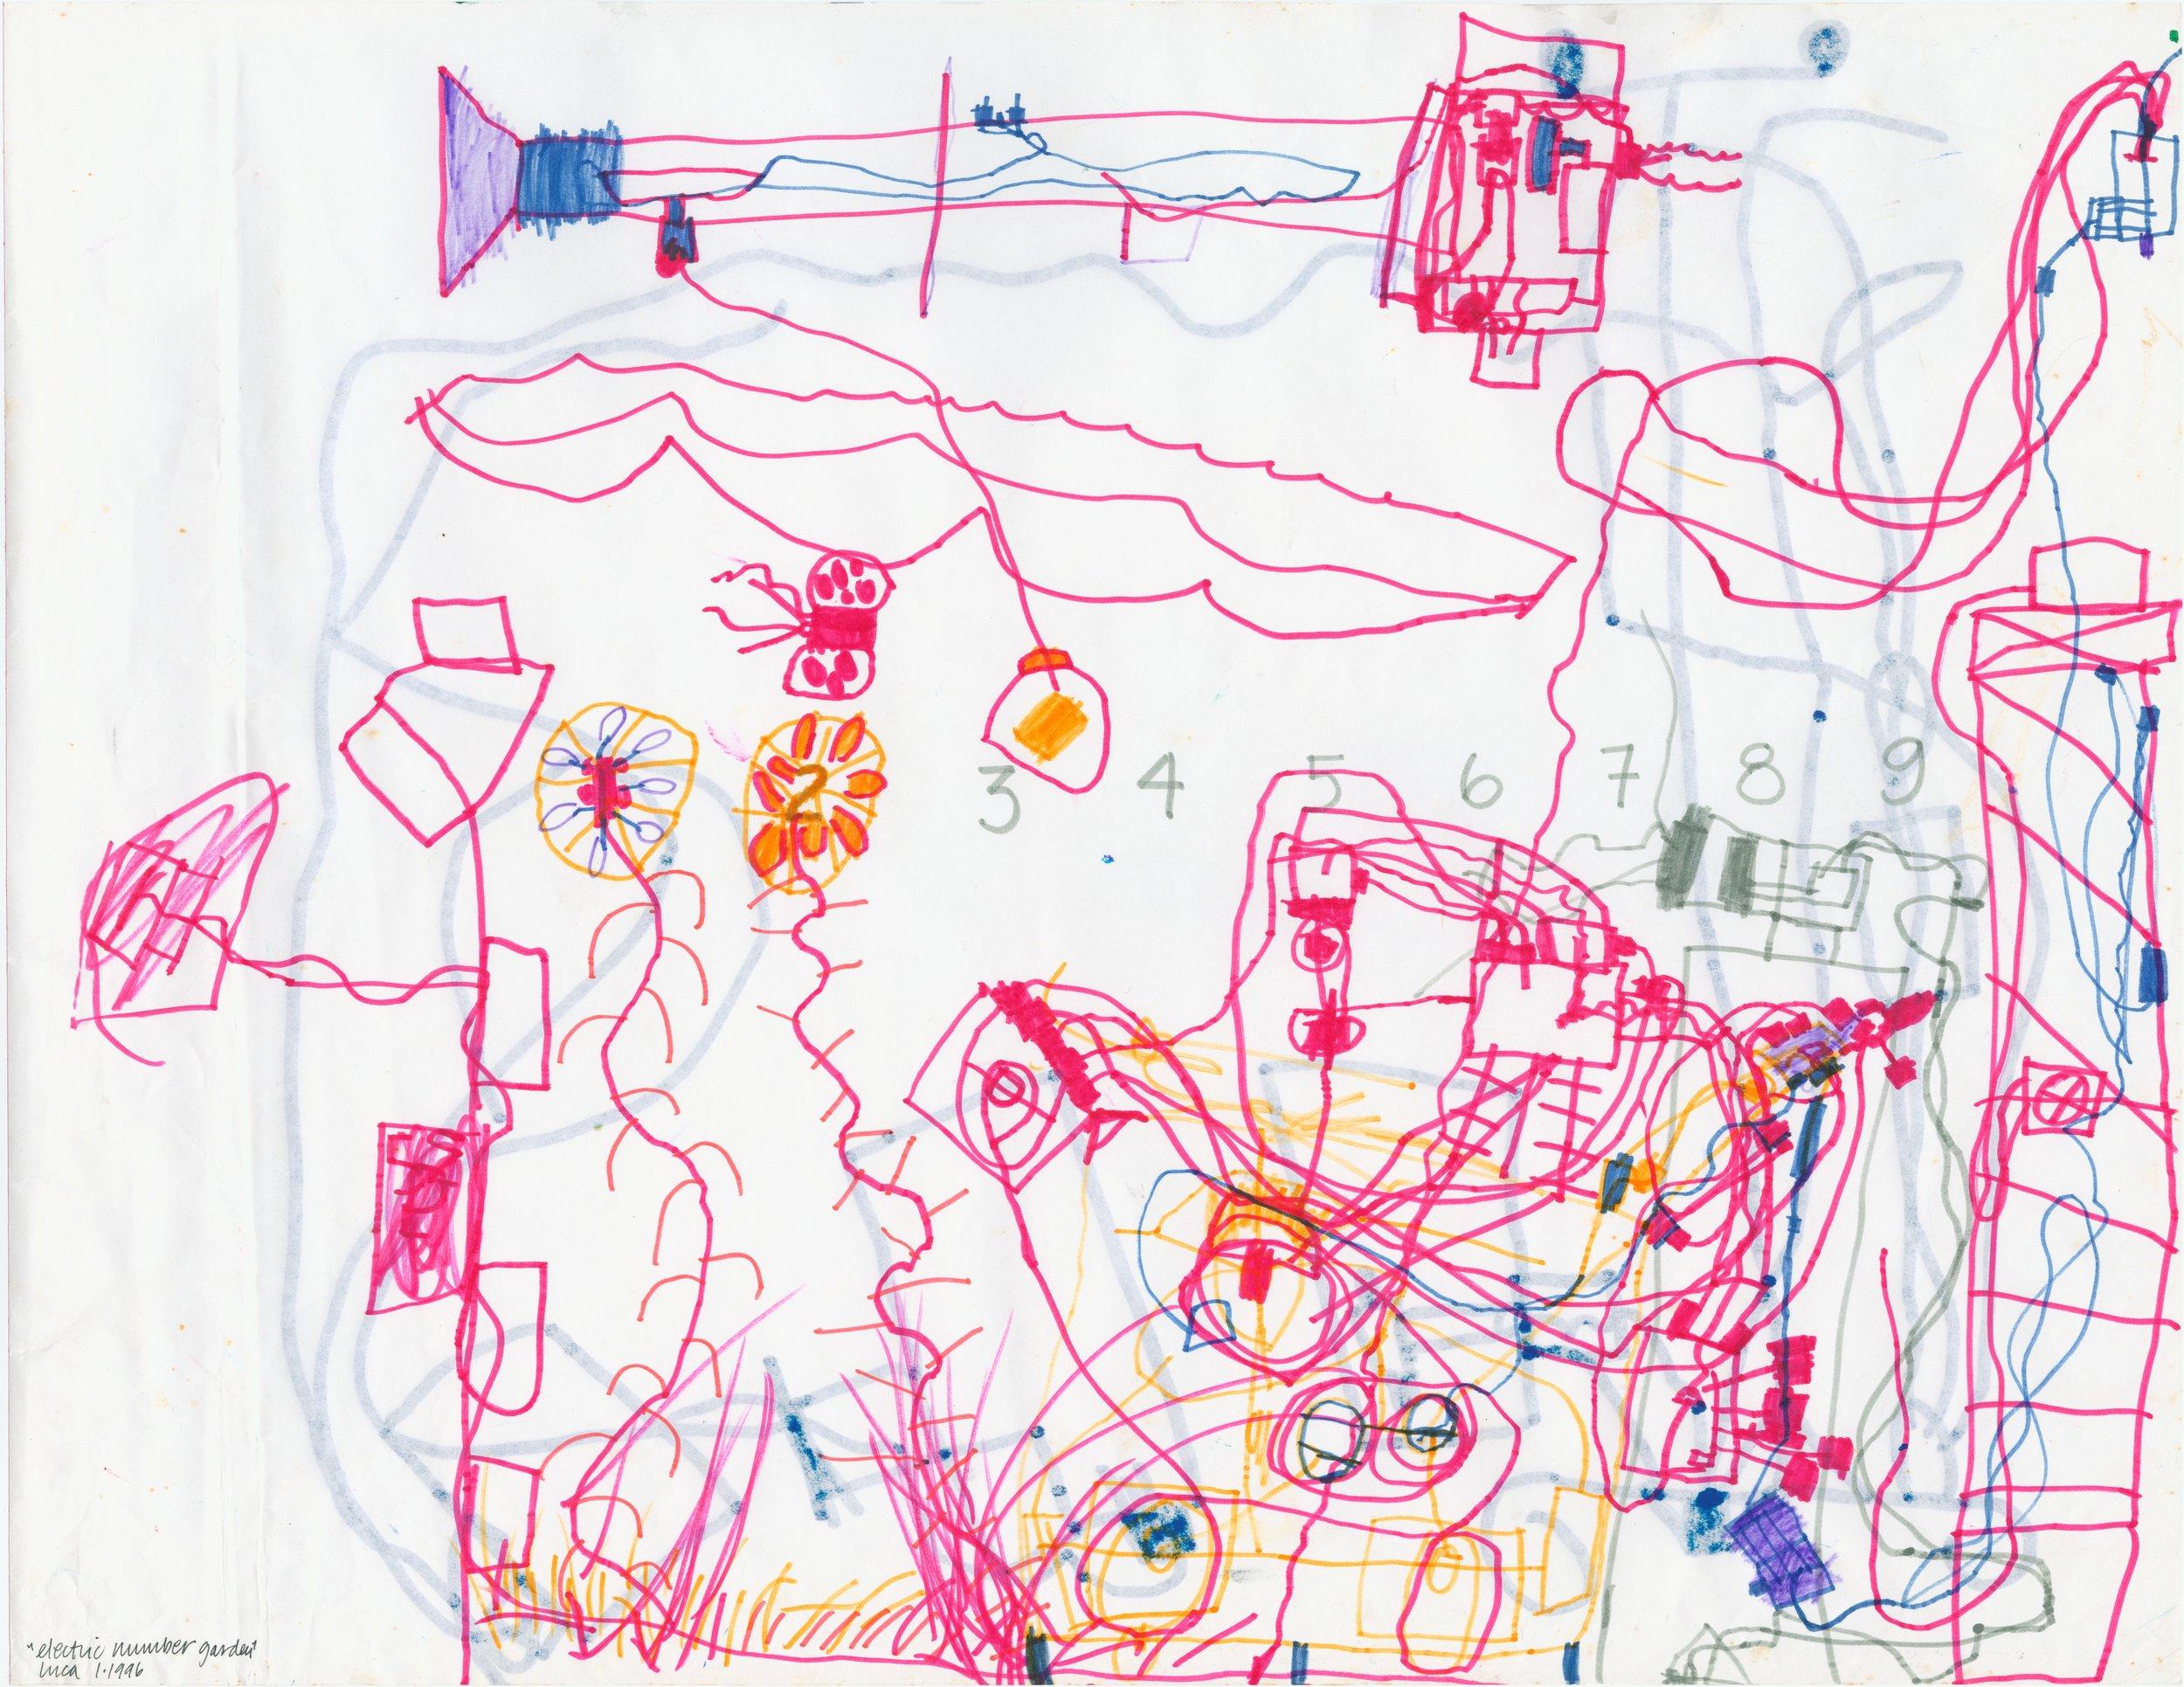 1996.01 - 008 - Electric number garden.pdf0000.jpg